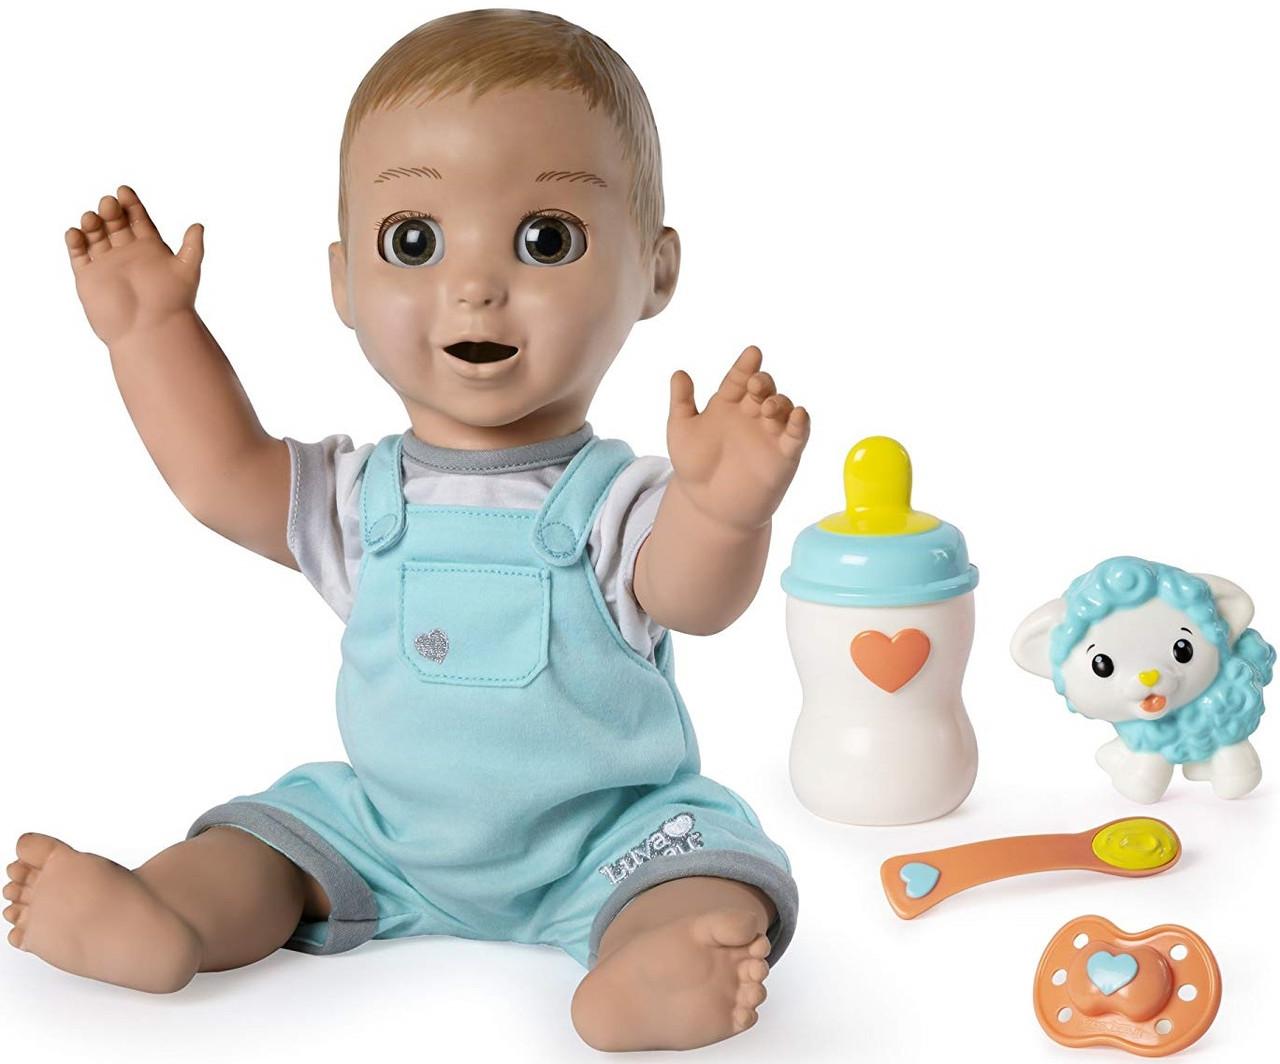 Интерактивная кукла Пупс Лувабелла Мальчик Luvabeau, Оригинал из США от Spin-Master